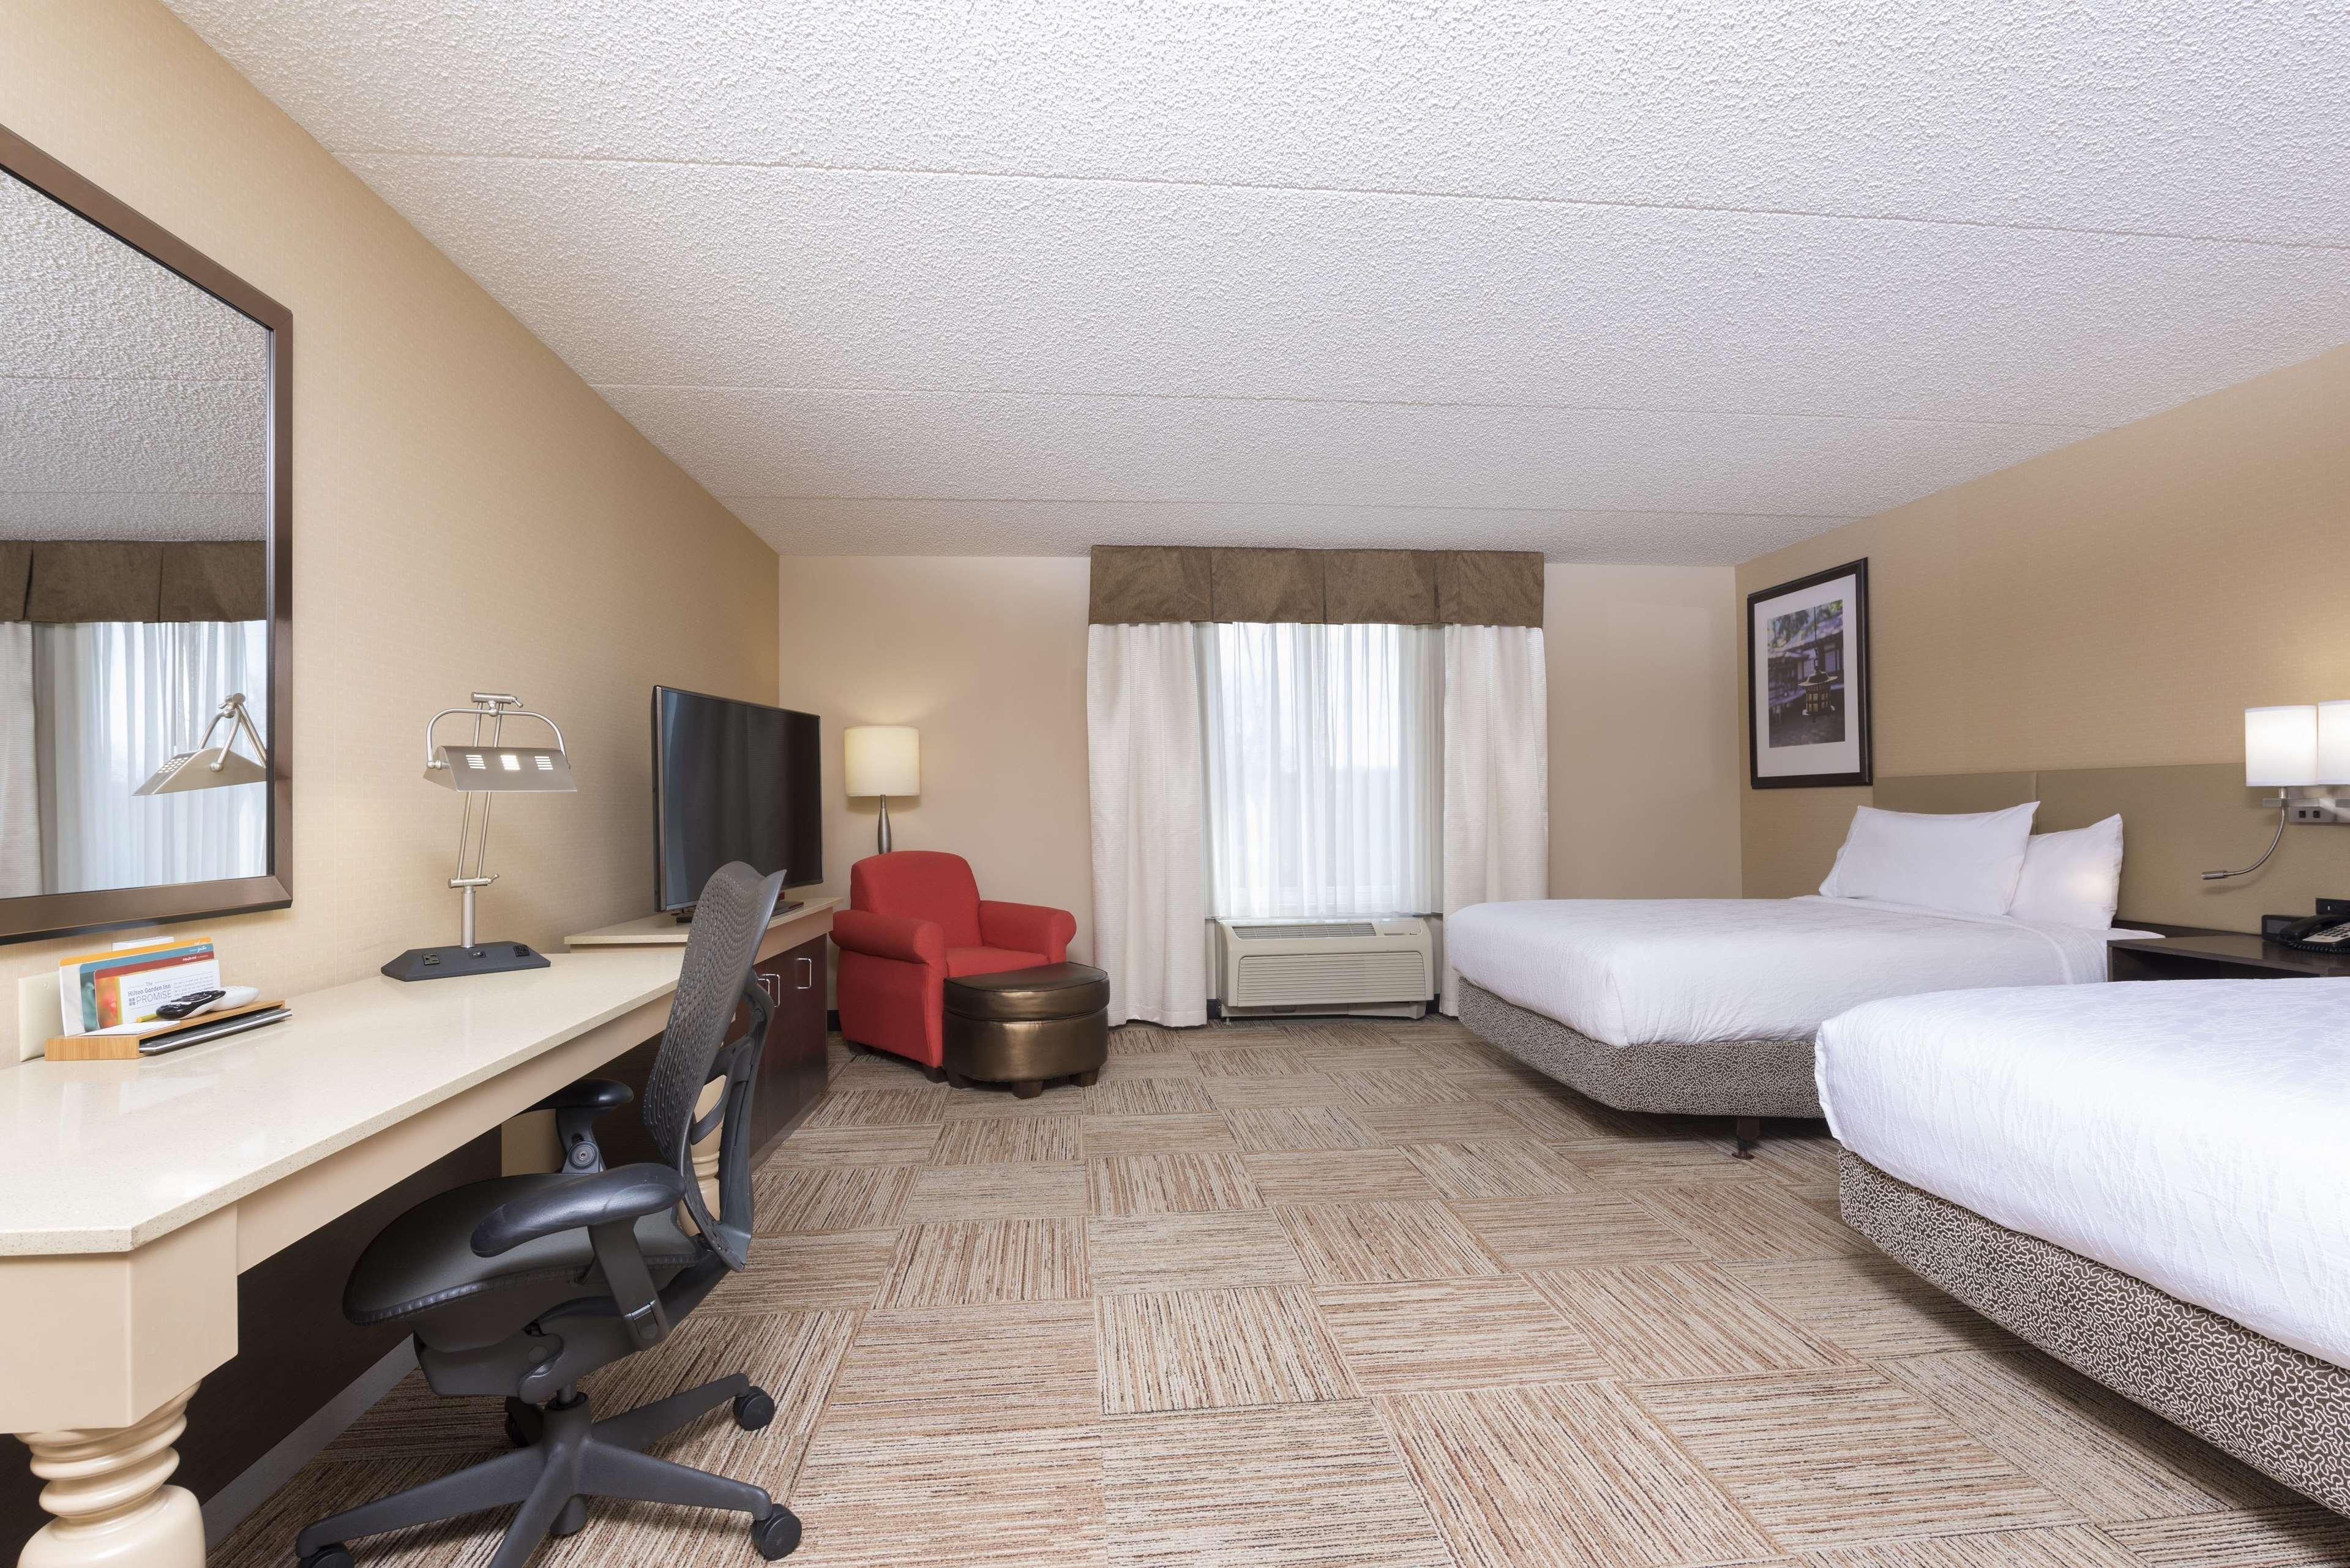 Hilton Garden Inn West Lafayette Wabash Landing image 54